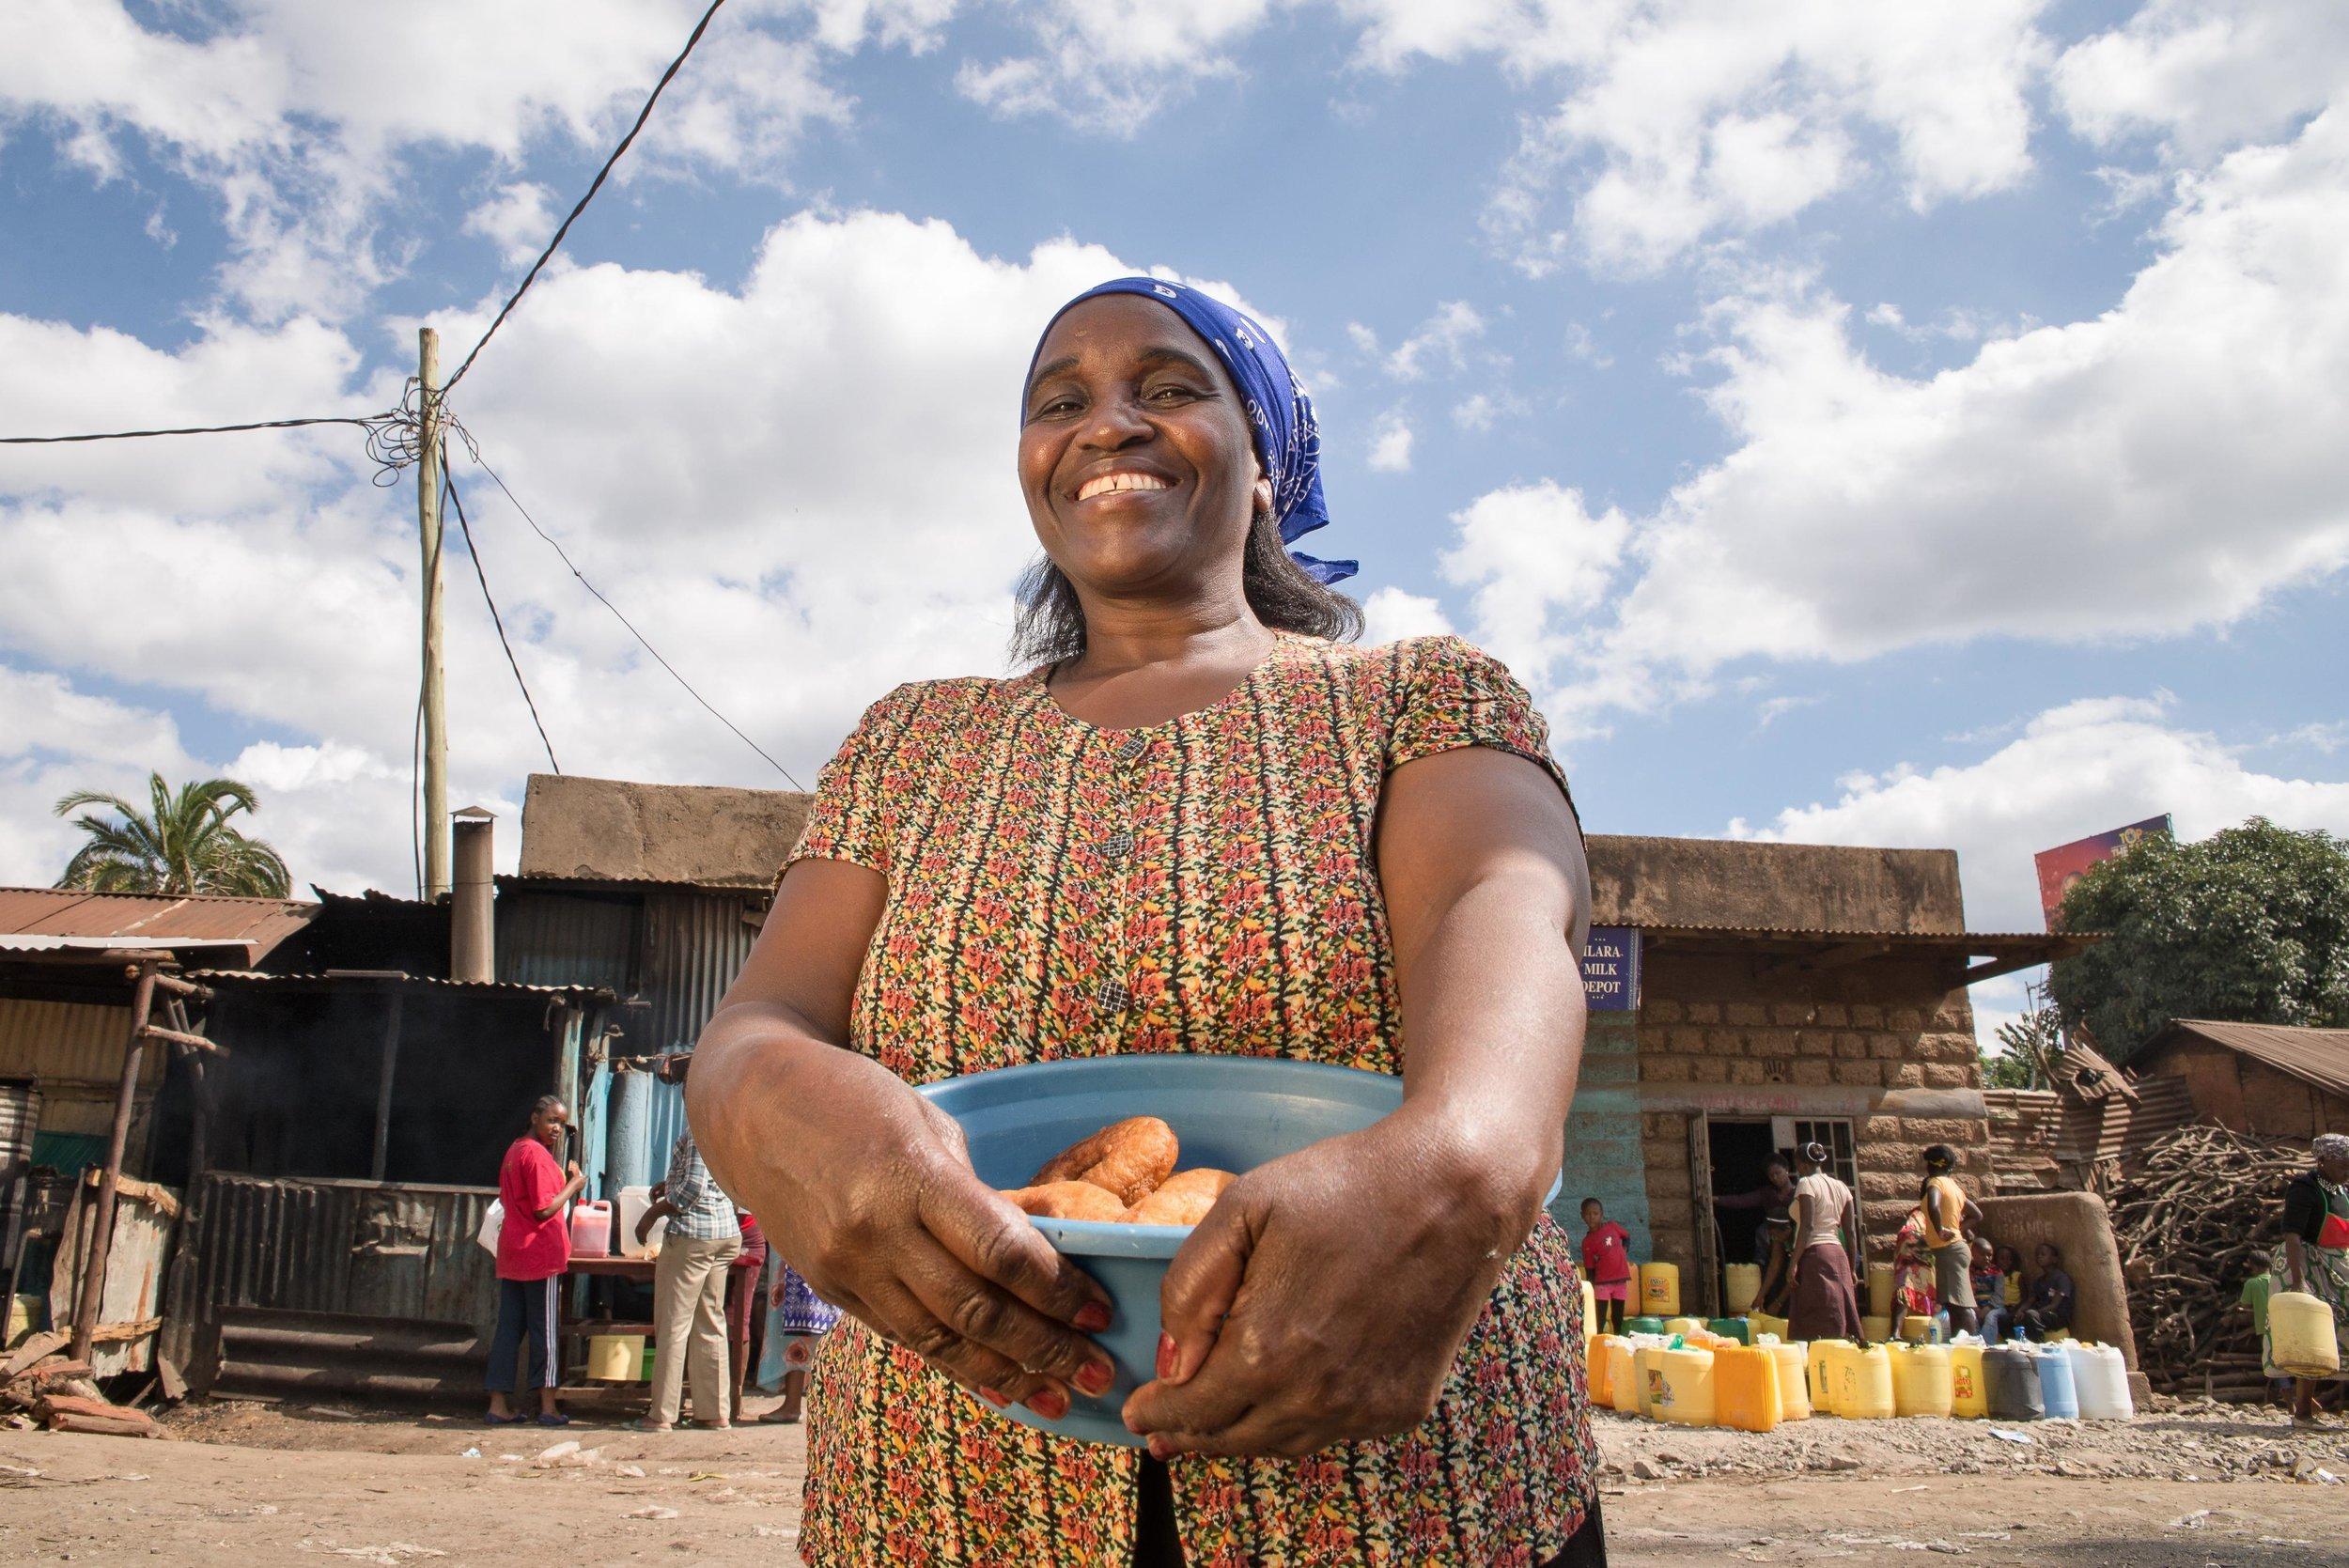 A portrait of Susan Wairimu, a 50-year-old baker in Kawangware, an informal settlement in Nairobi, Kenya. Oxfam, 2017.